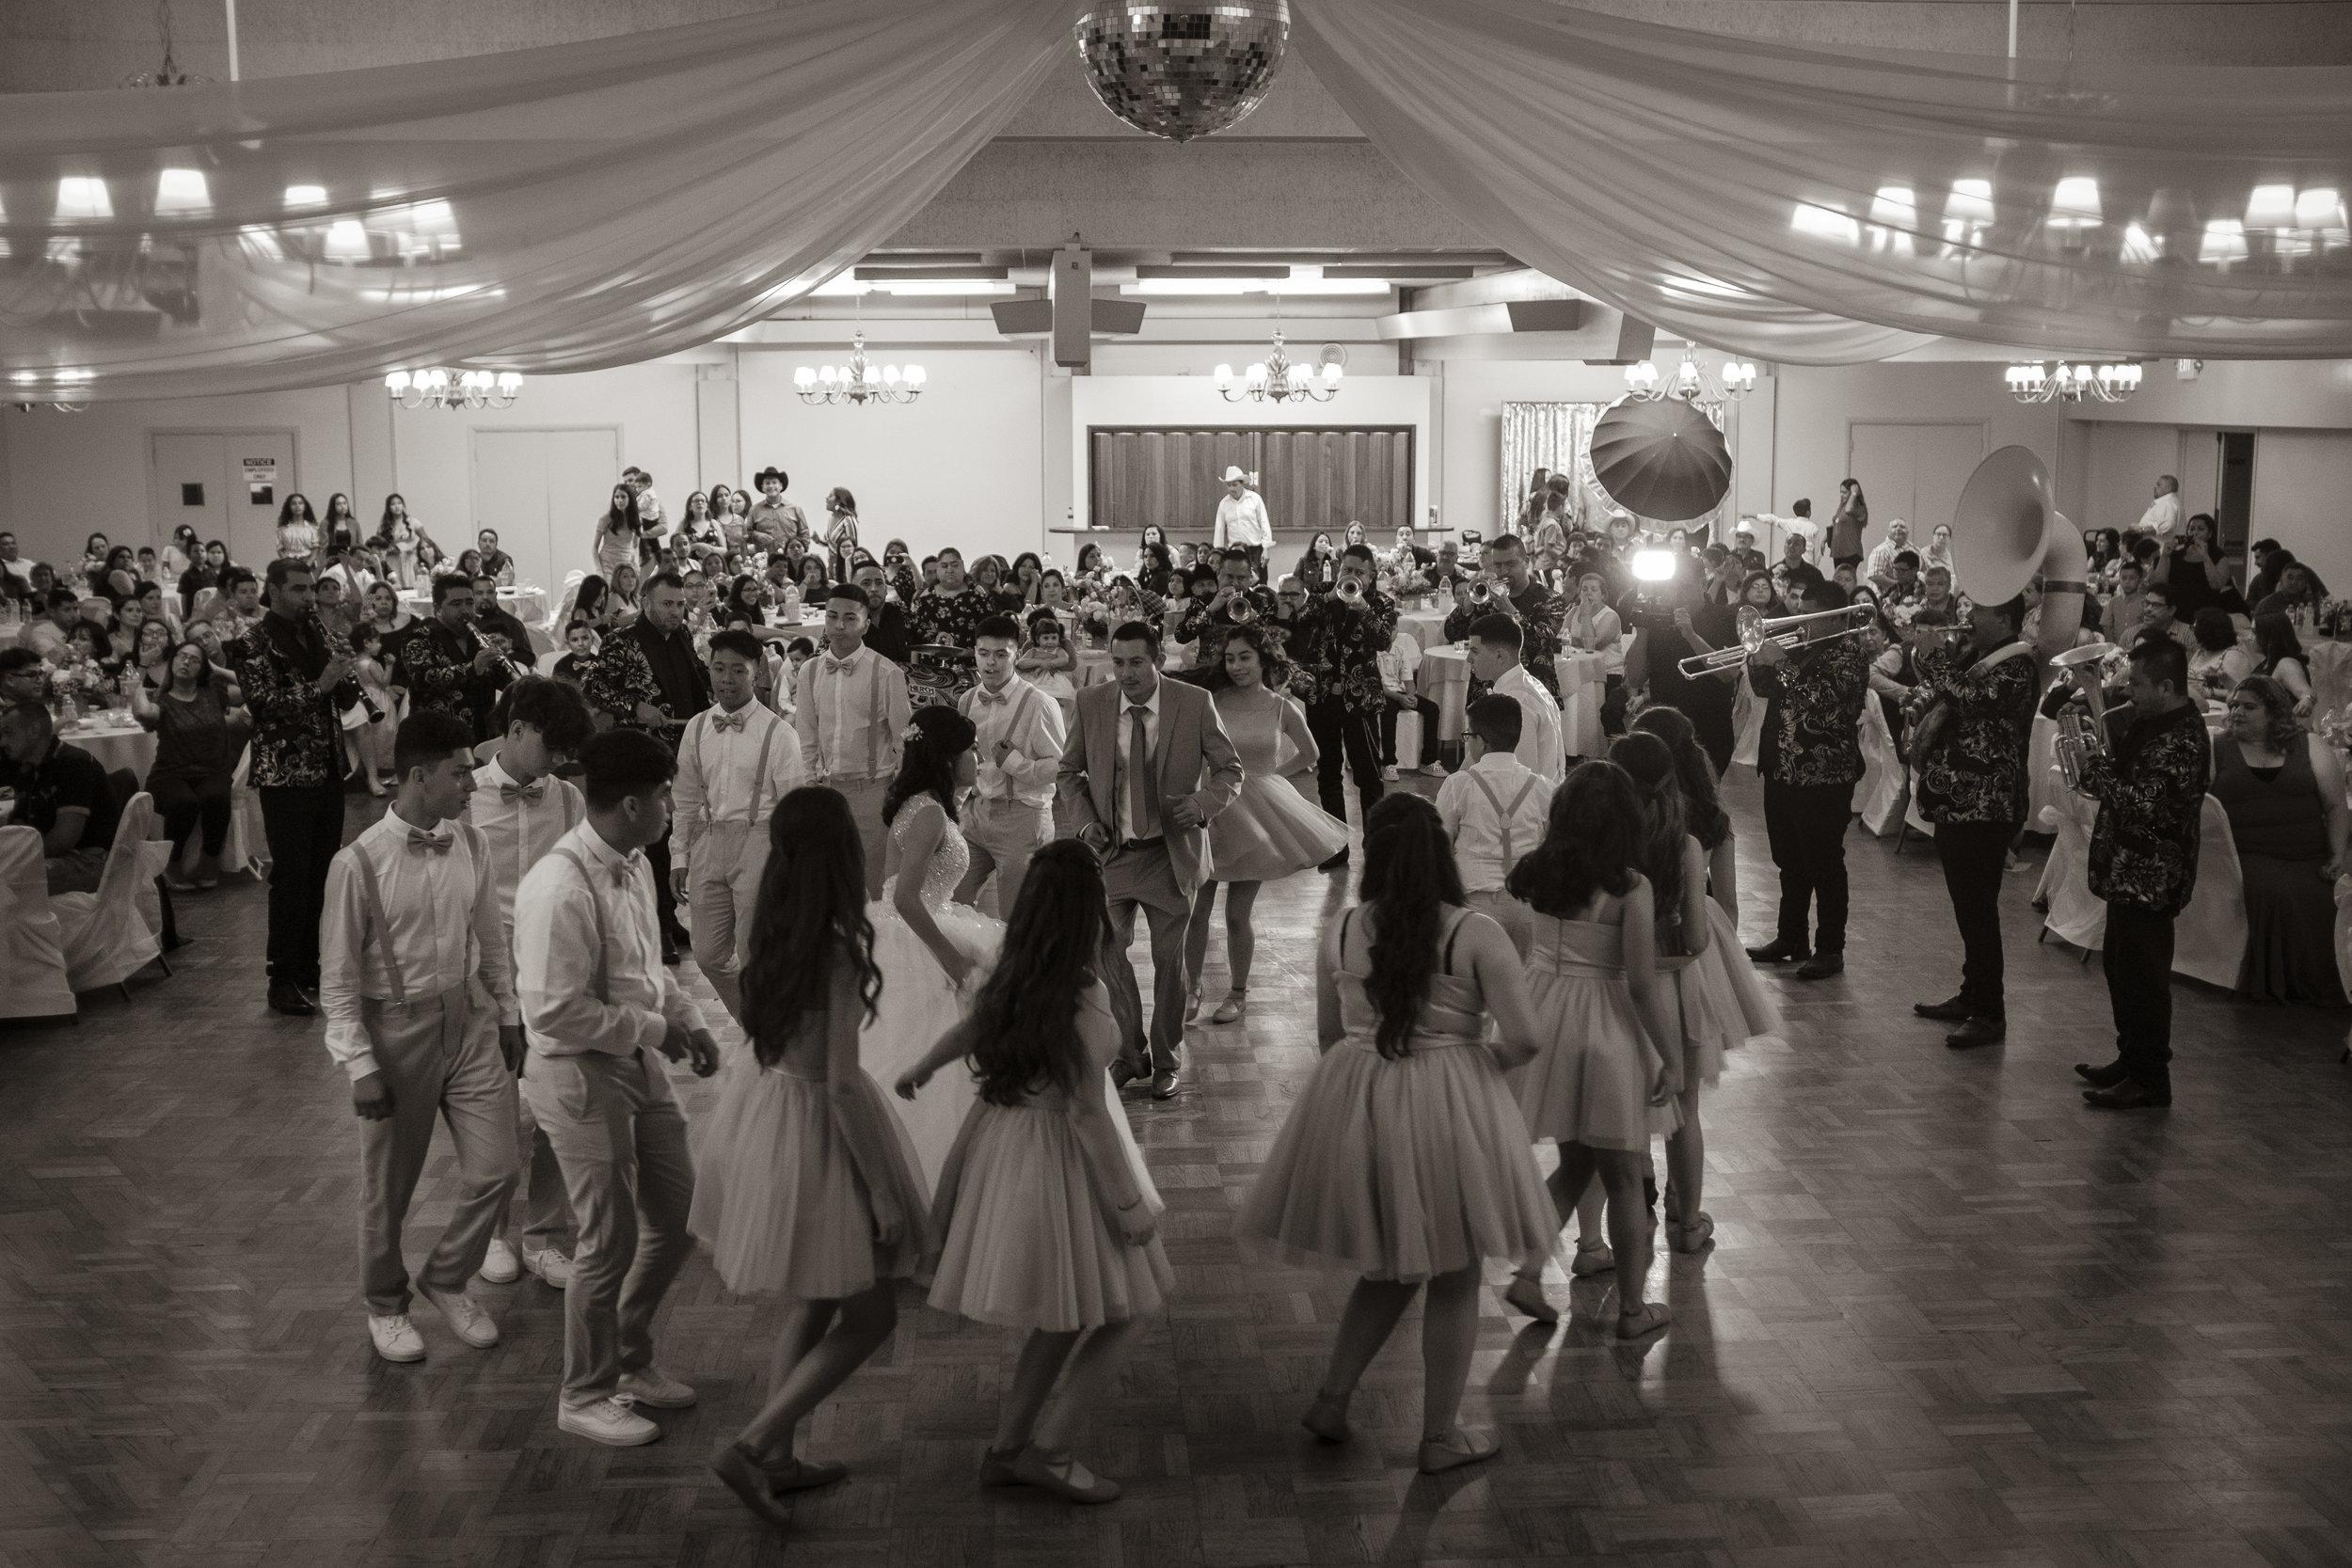 michelle_dancing.JPG